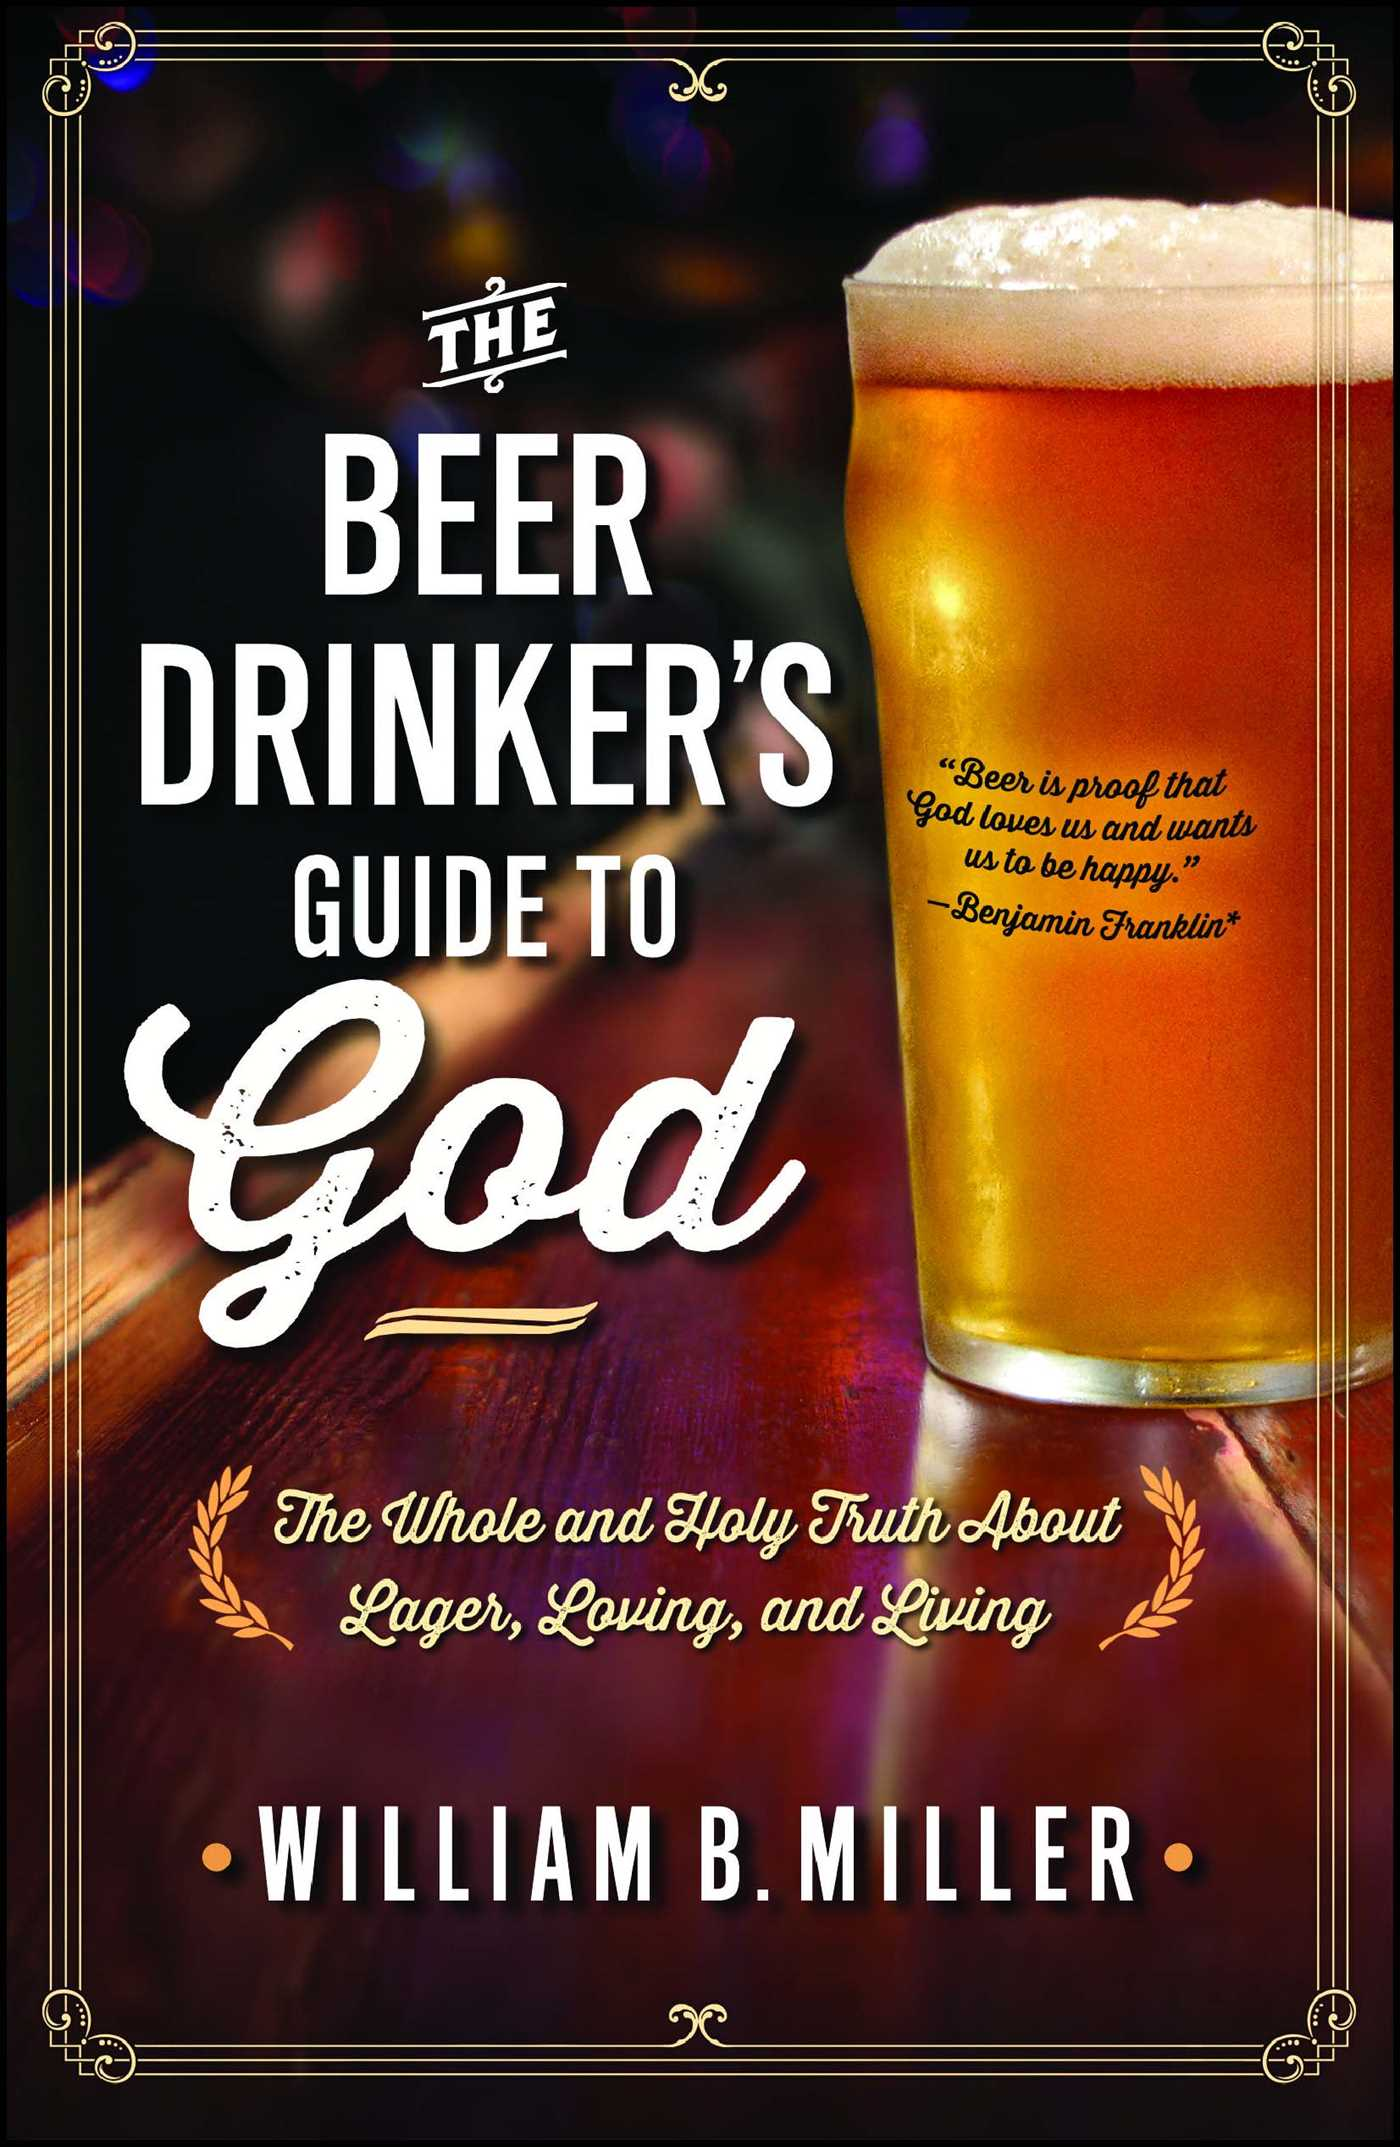 Wine for beer drinkers